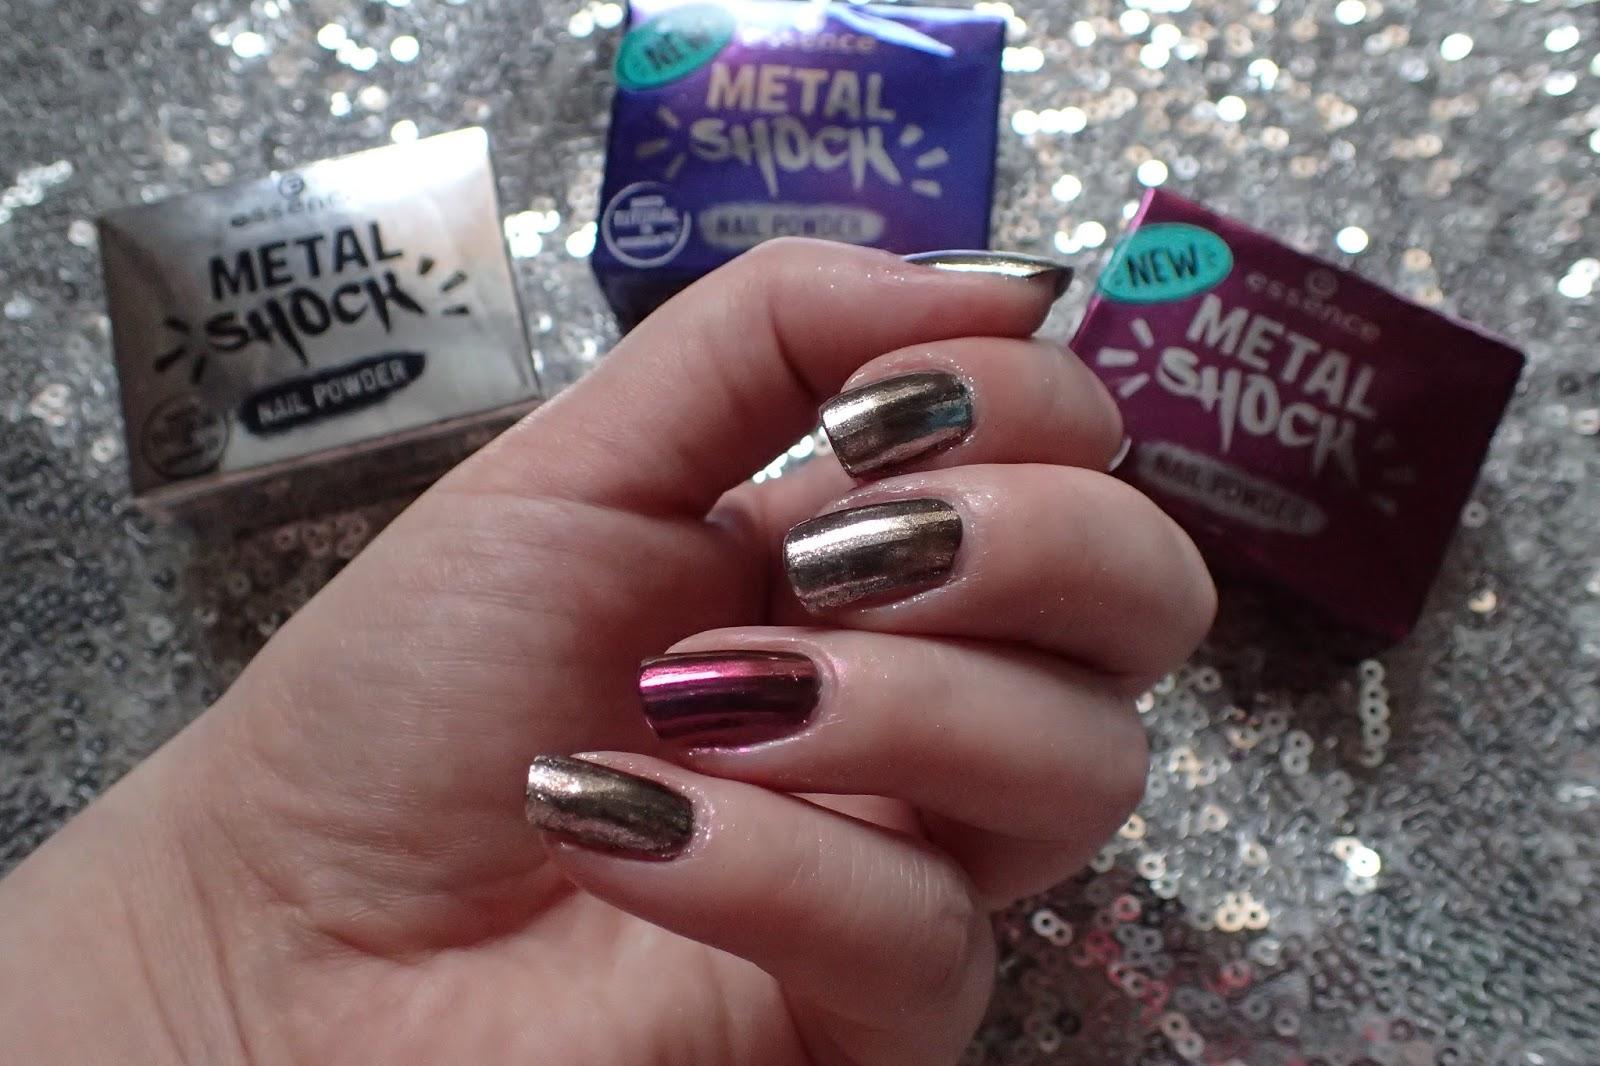 Alice In Wonderland Cz Recenze Metalicke Pigmenty Metal Shock Od Essence